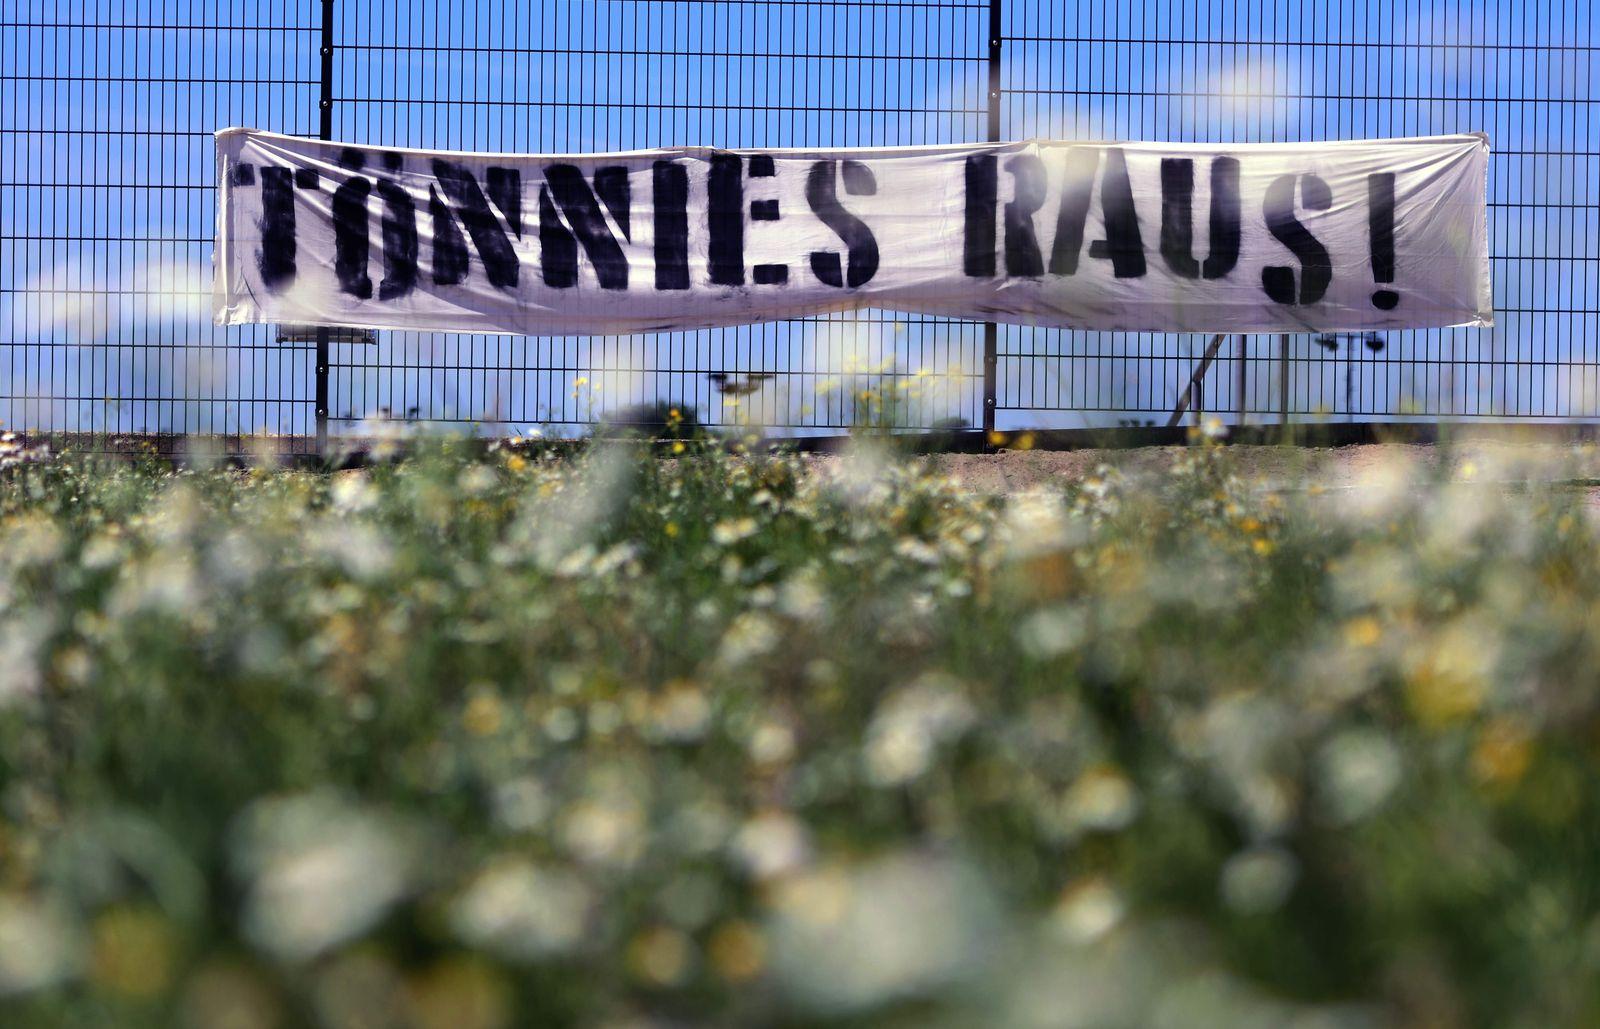 GERMANY-HEALTH-VIRUS-MEAT-PROTEST-FBL-SCHALKE-TOENNIES